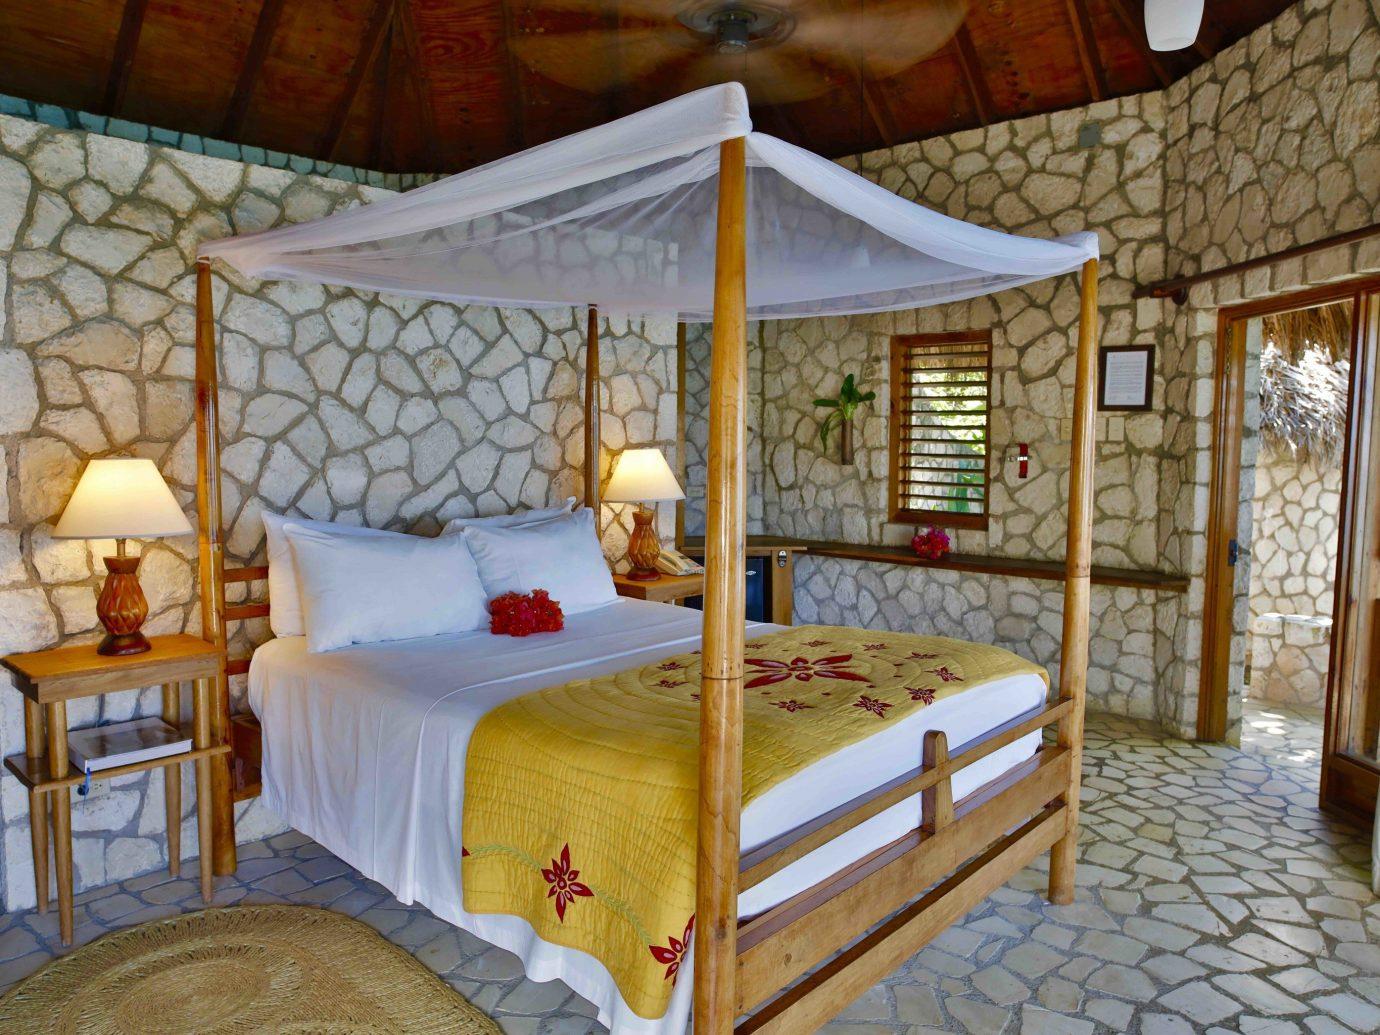 Bedroom at Rockhouse Hotel